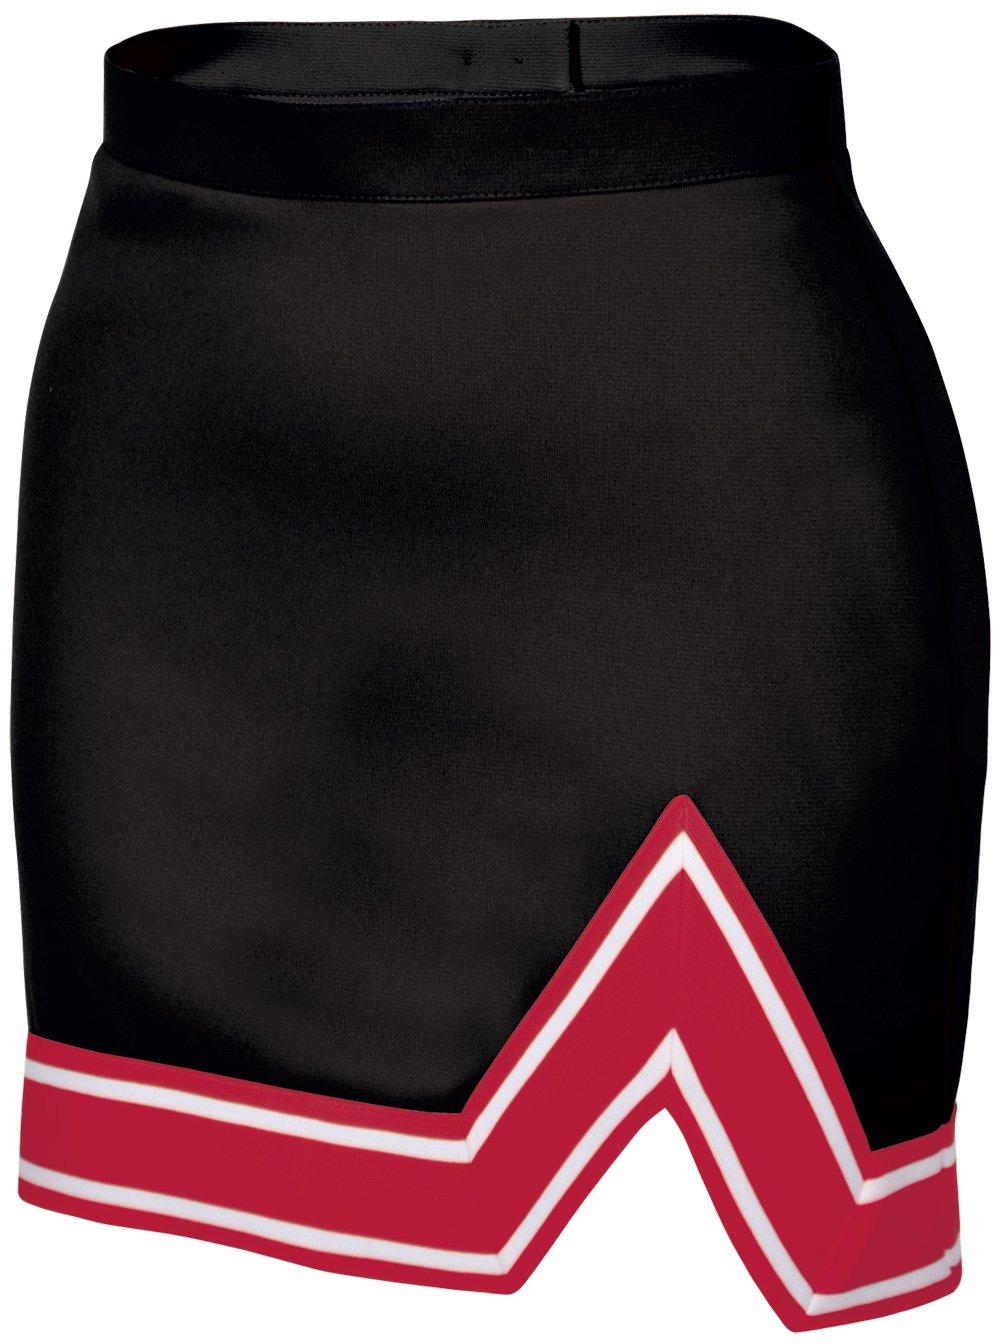 Chassé Womens' Blaze Skirt Black/White/Red Adult X-Small